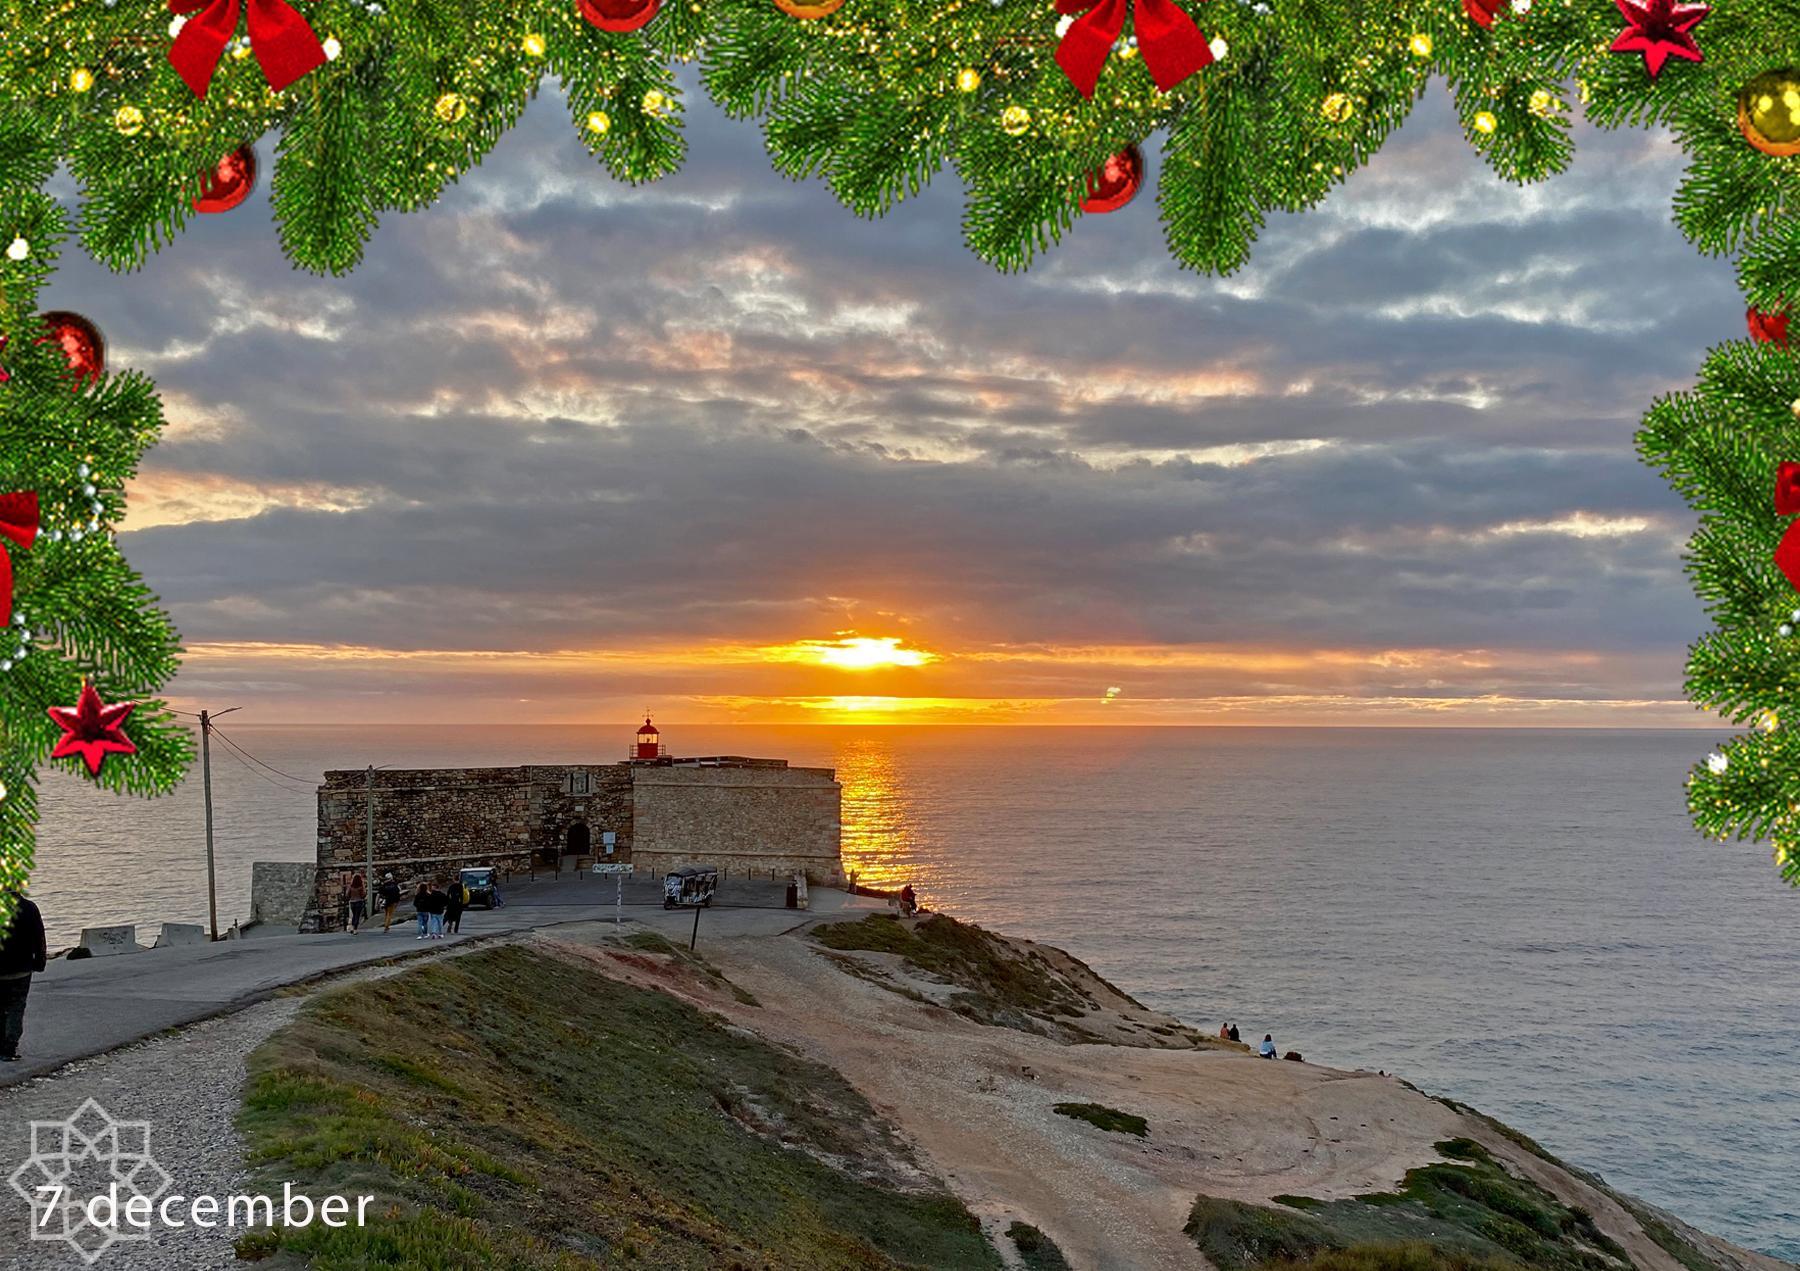 December 7 year 2020 Portugal